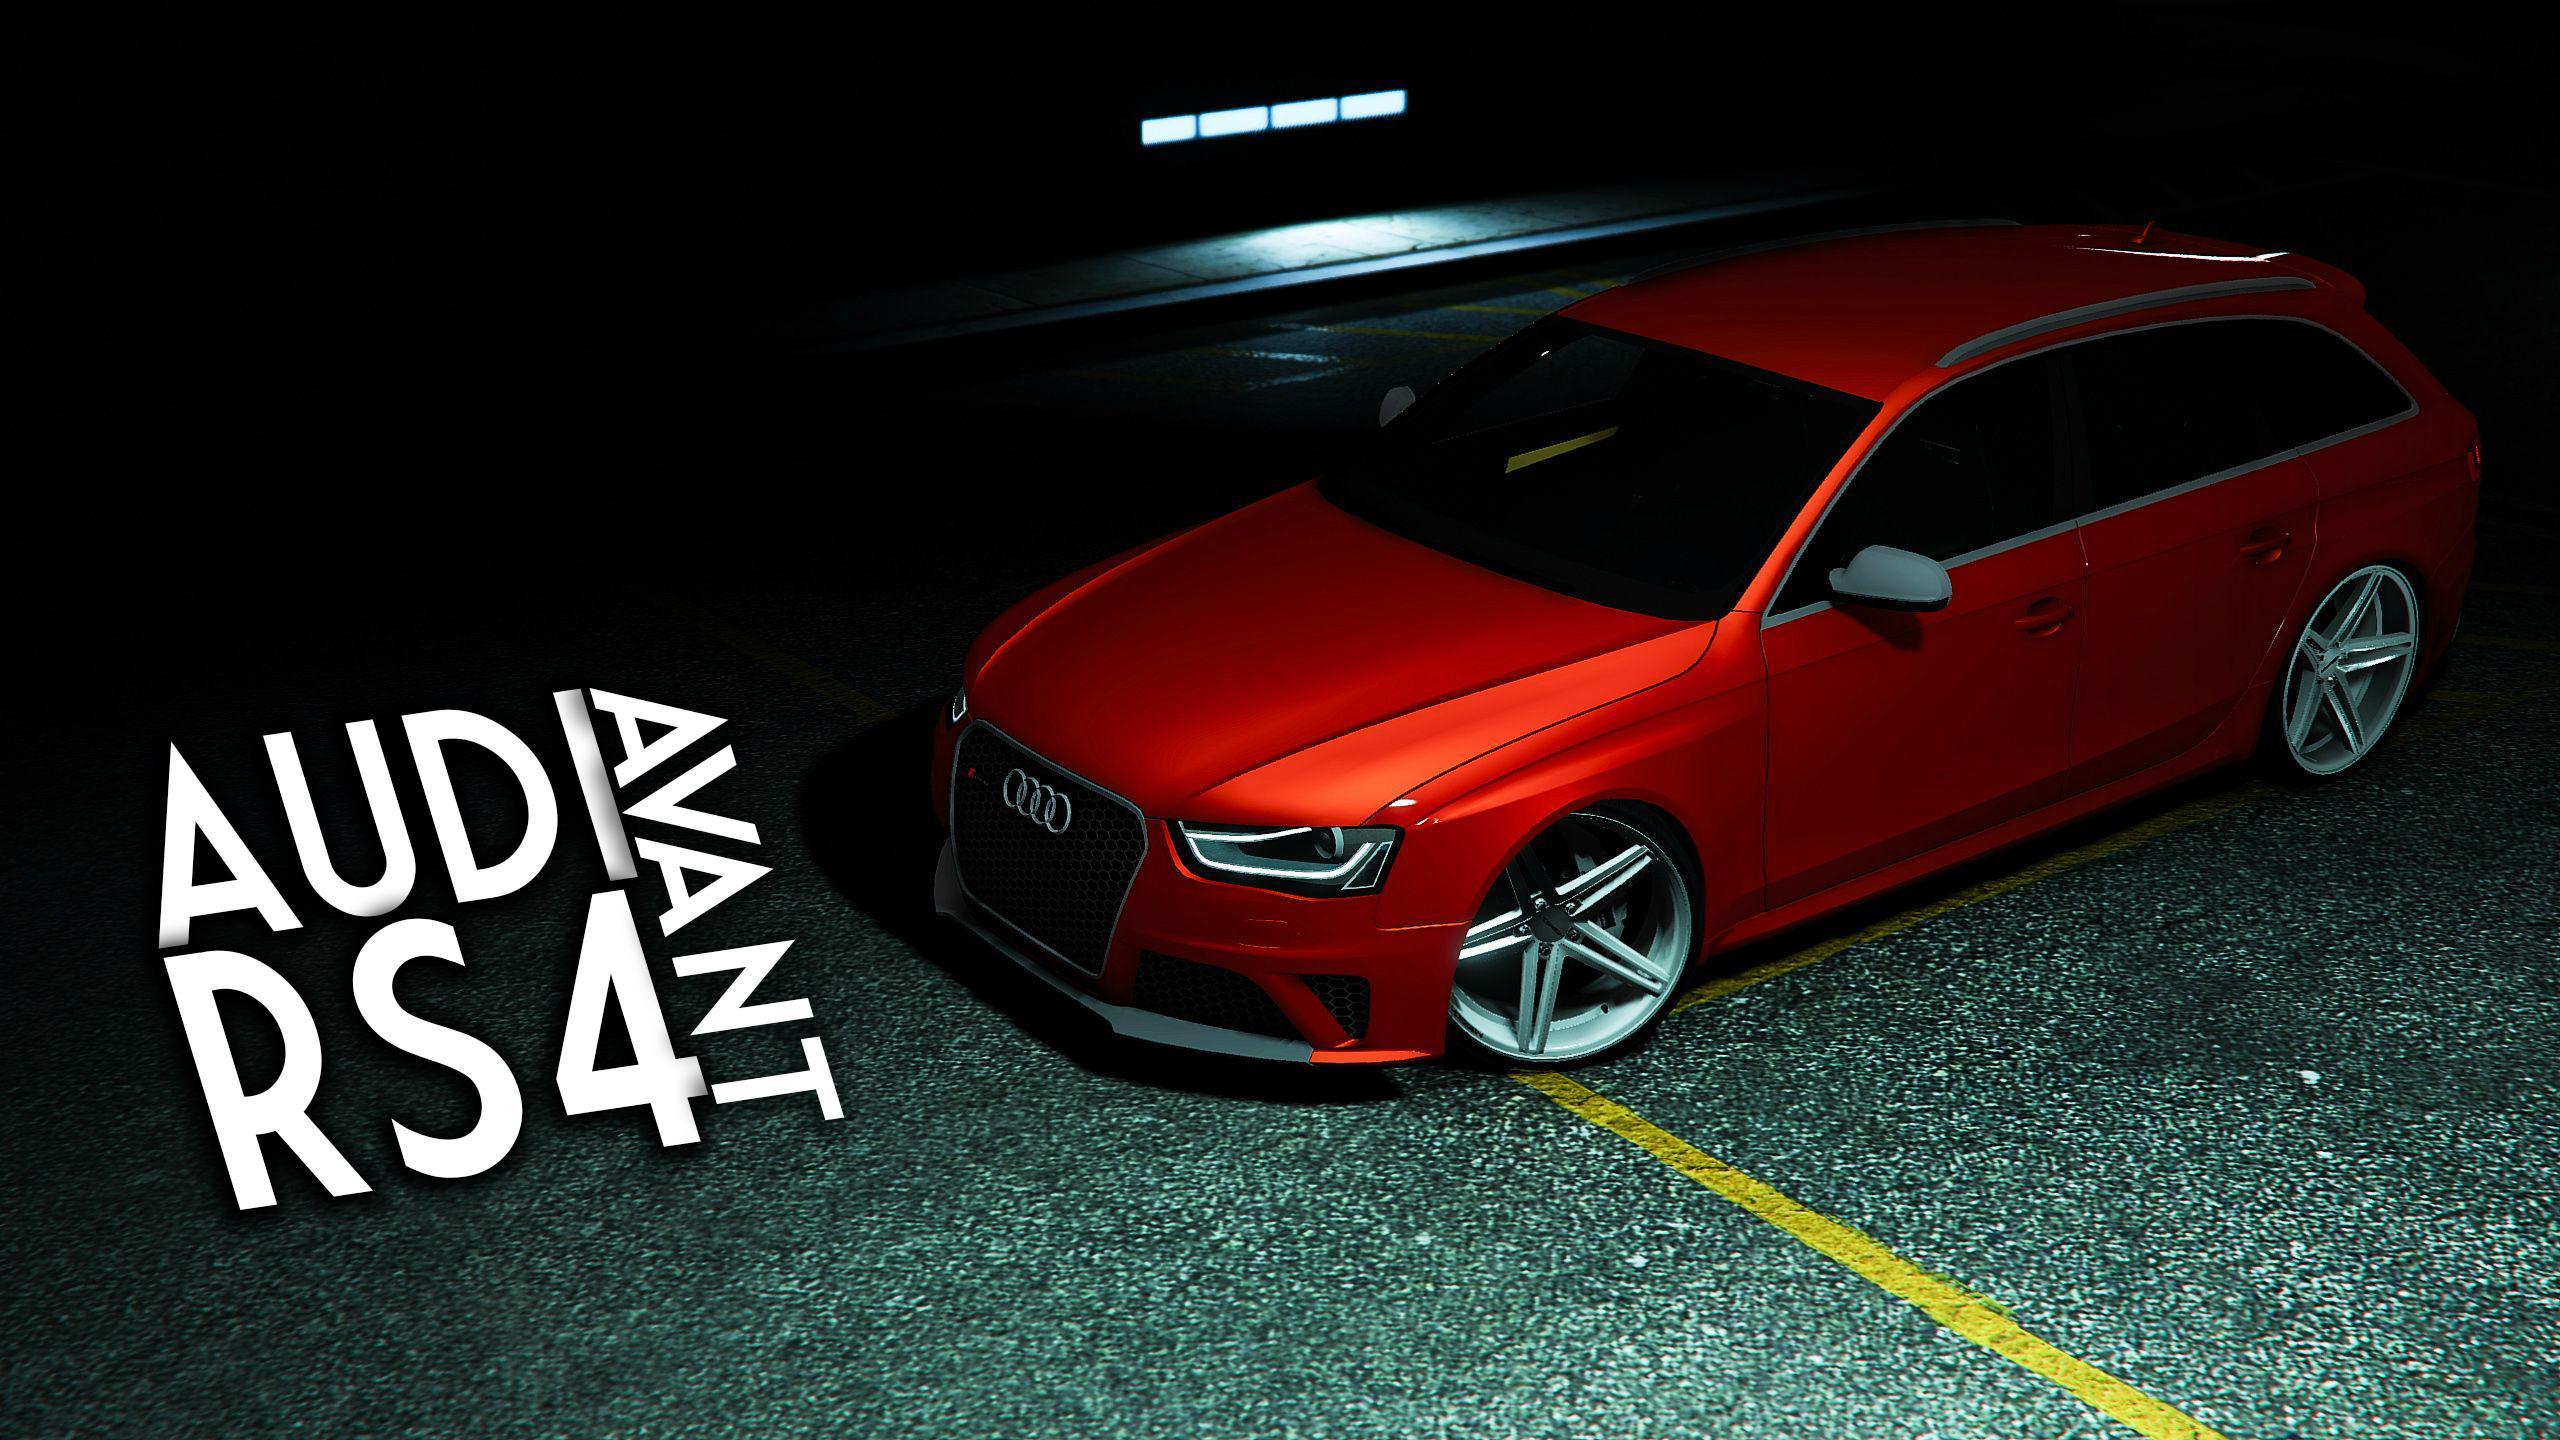 Audi Rs4 Avant Gta5 Mods Com